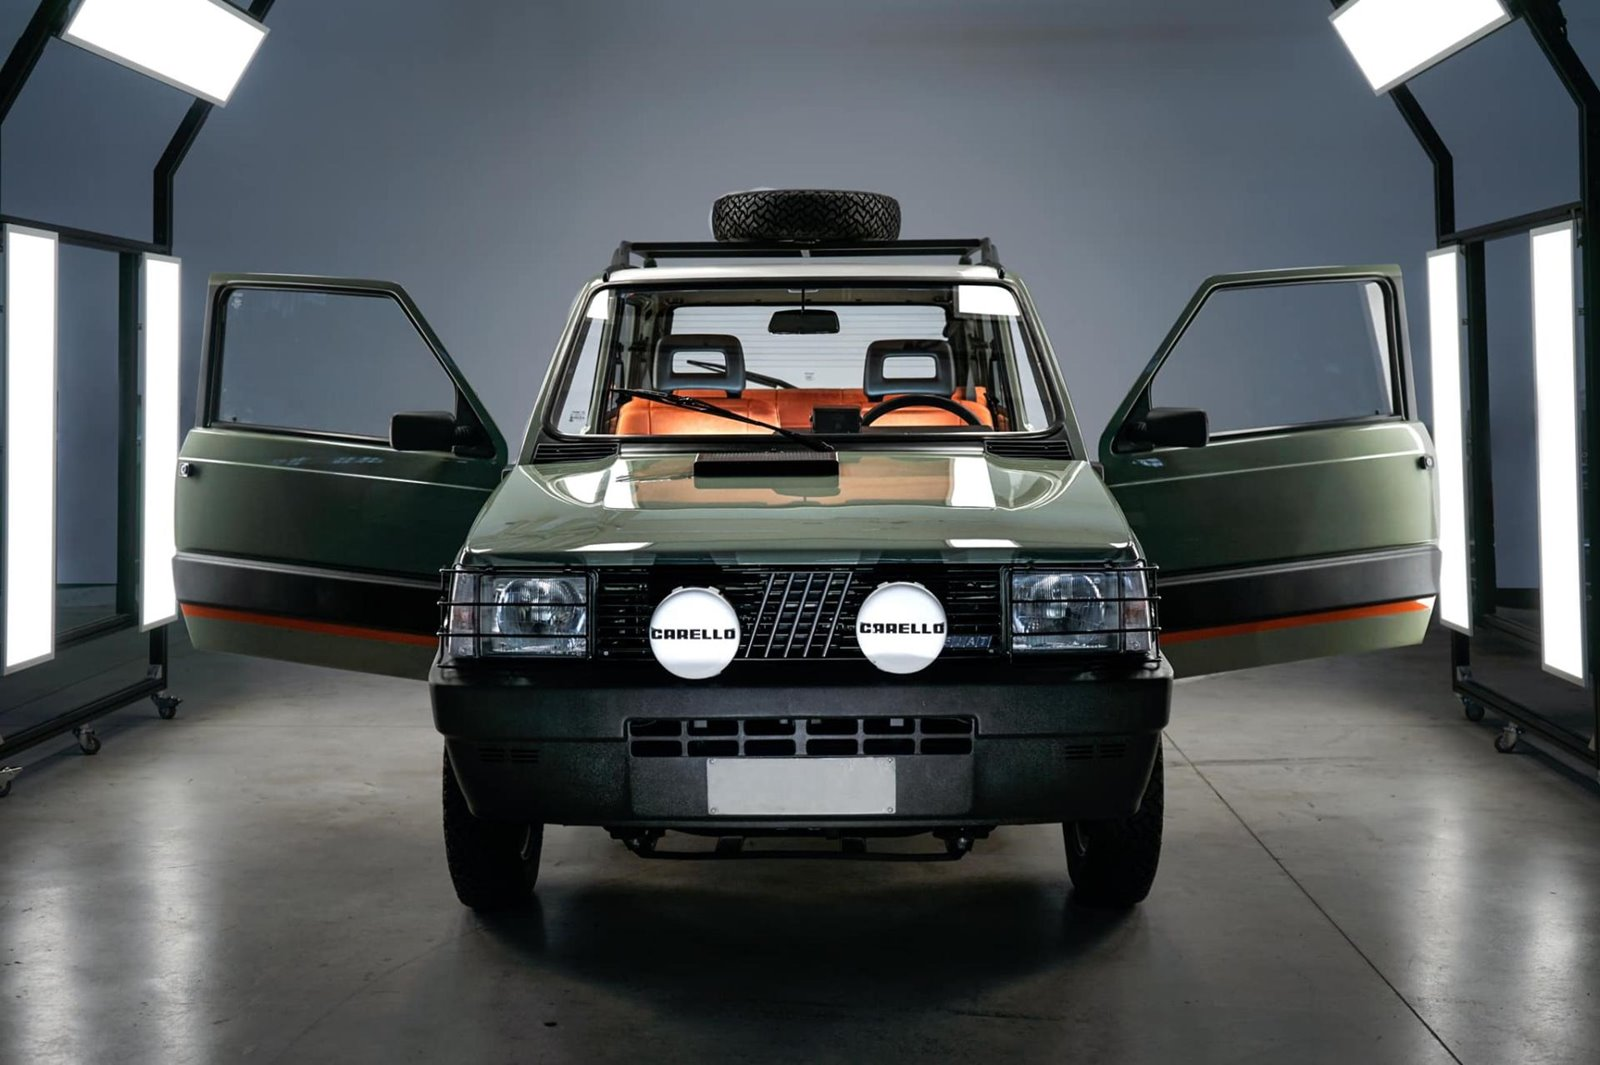 Fiat Panda 4x4 Icon E Un Clasico Ochentero Transformado En Un Coche Electrico De Lujo Forococheselectricos